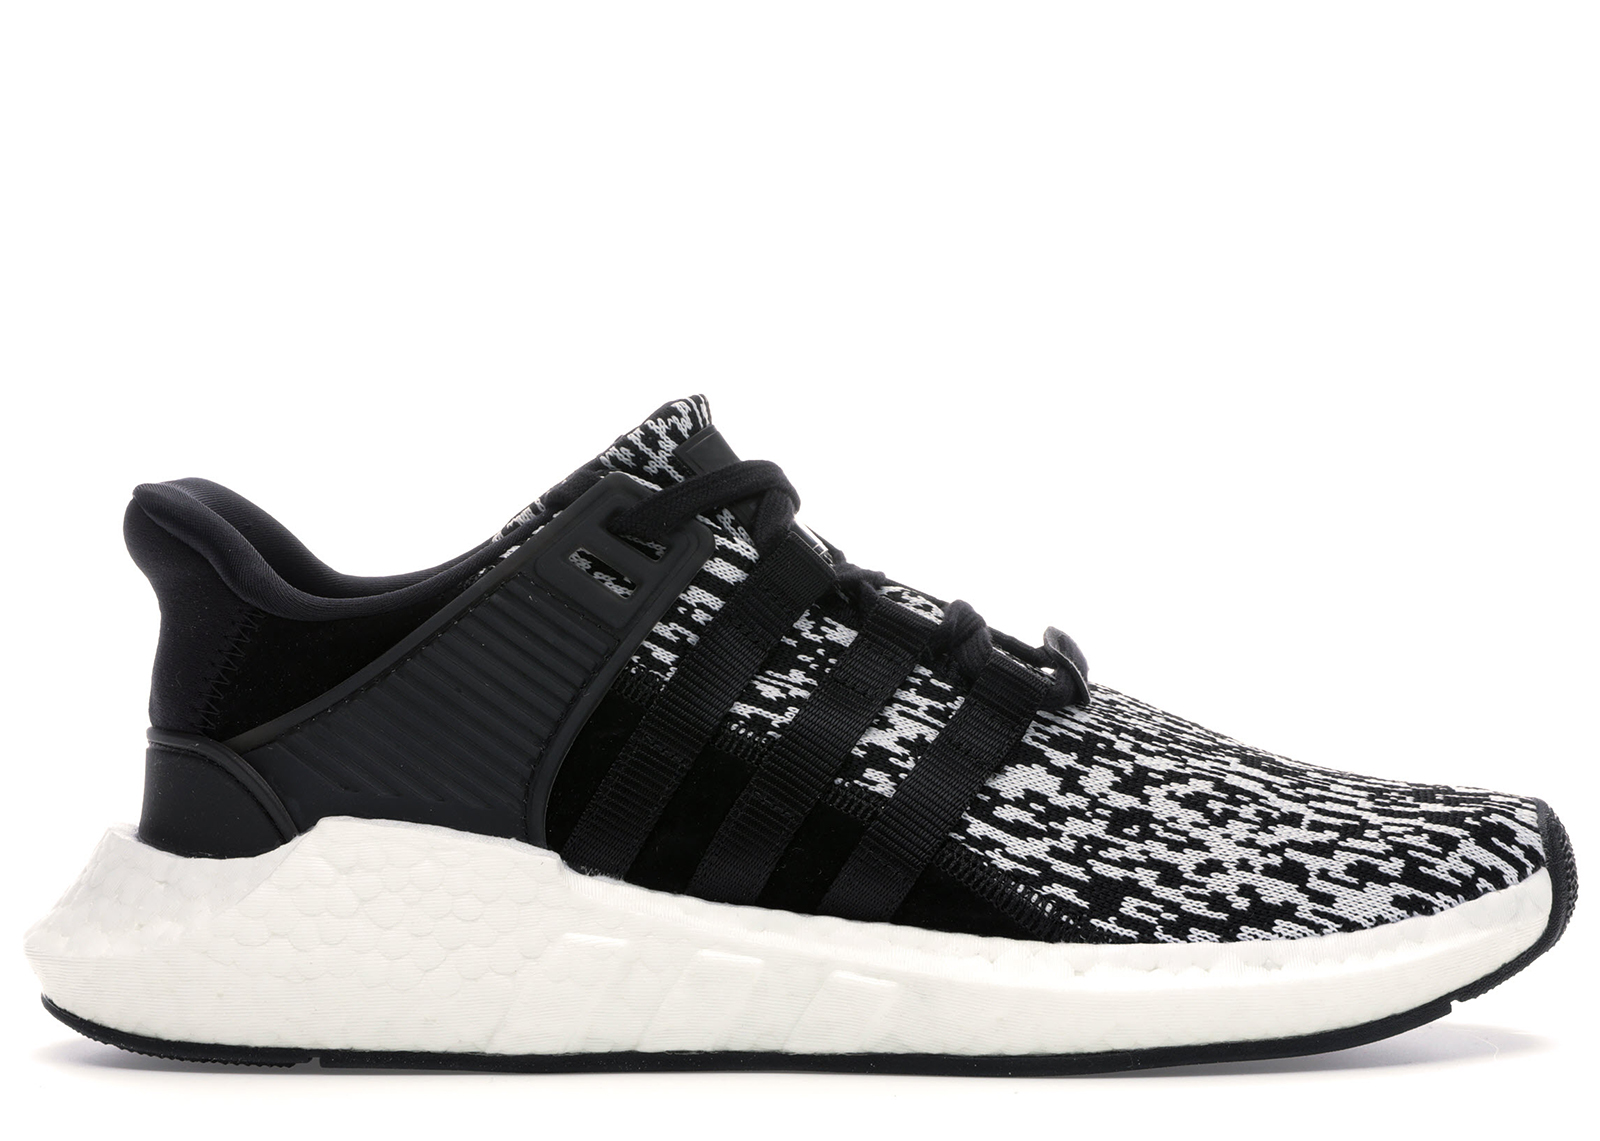 adidas EQT Support 93/17 Glitch Black